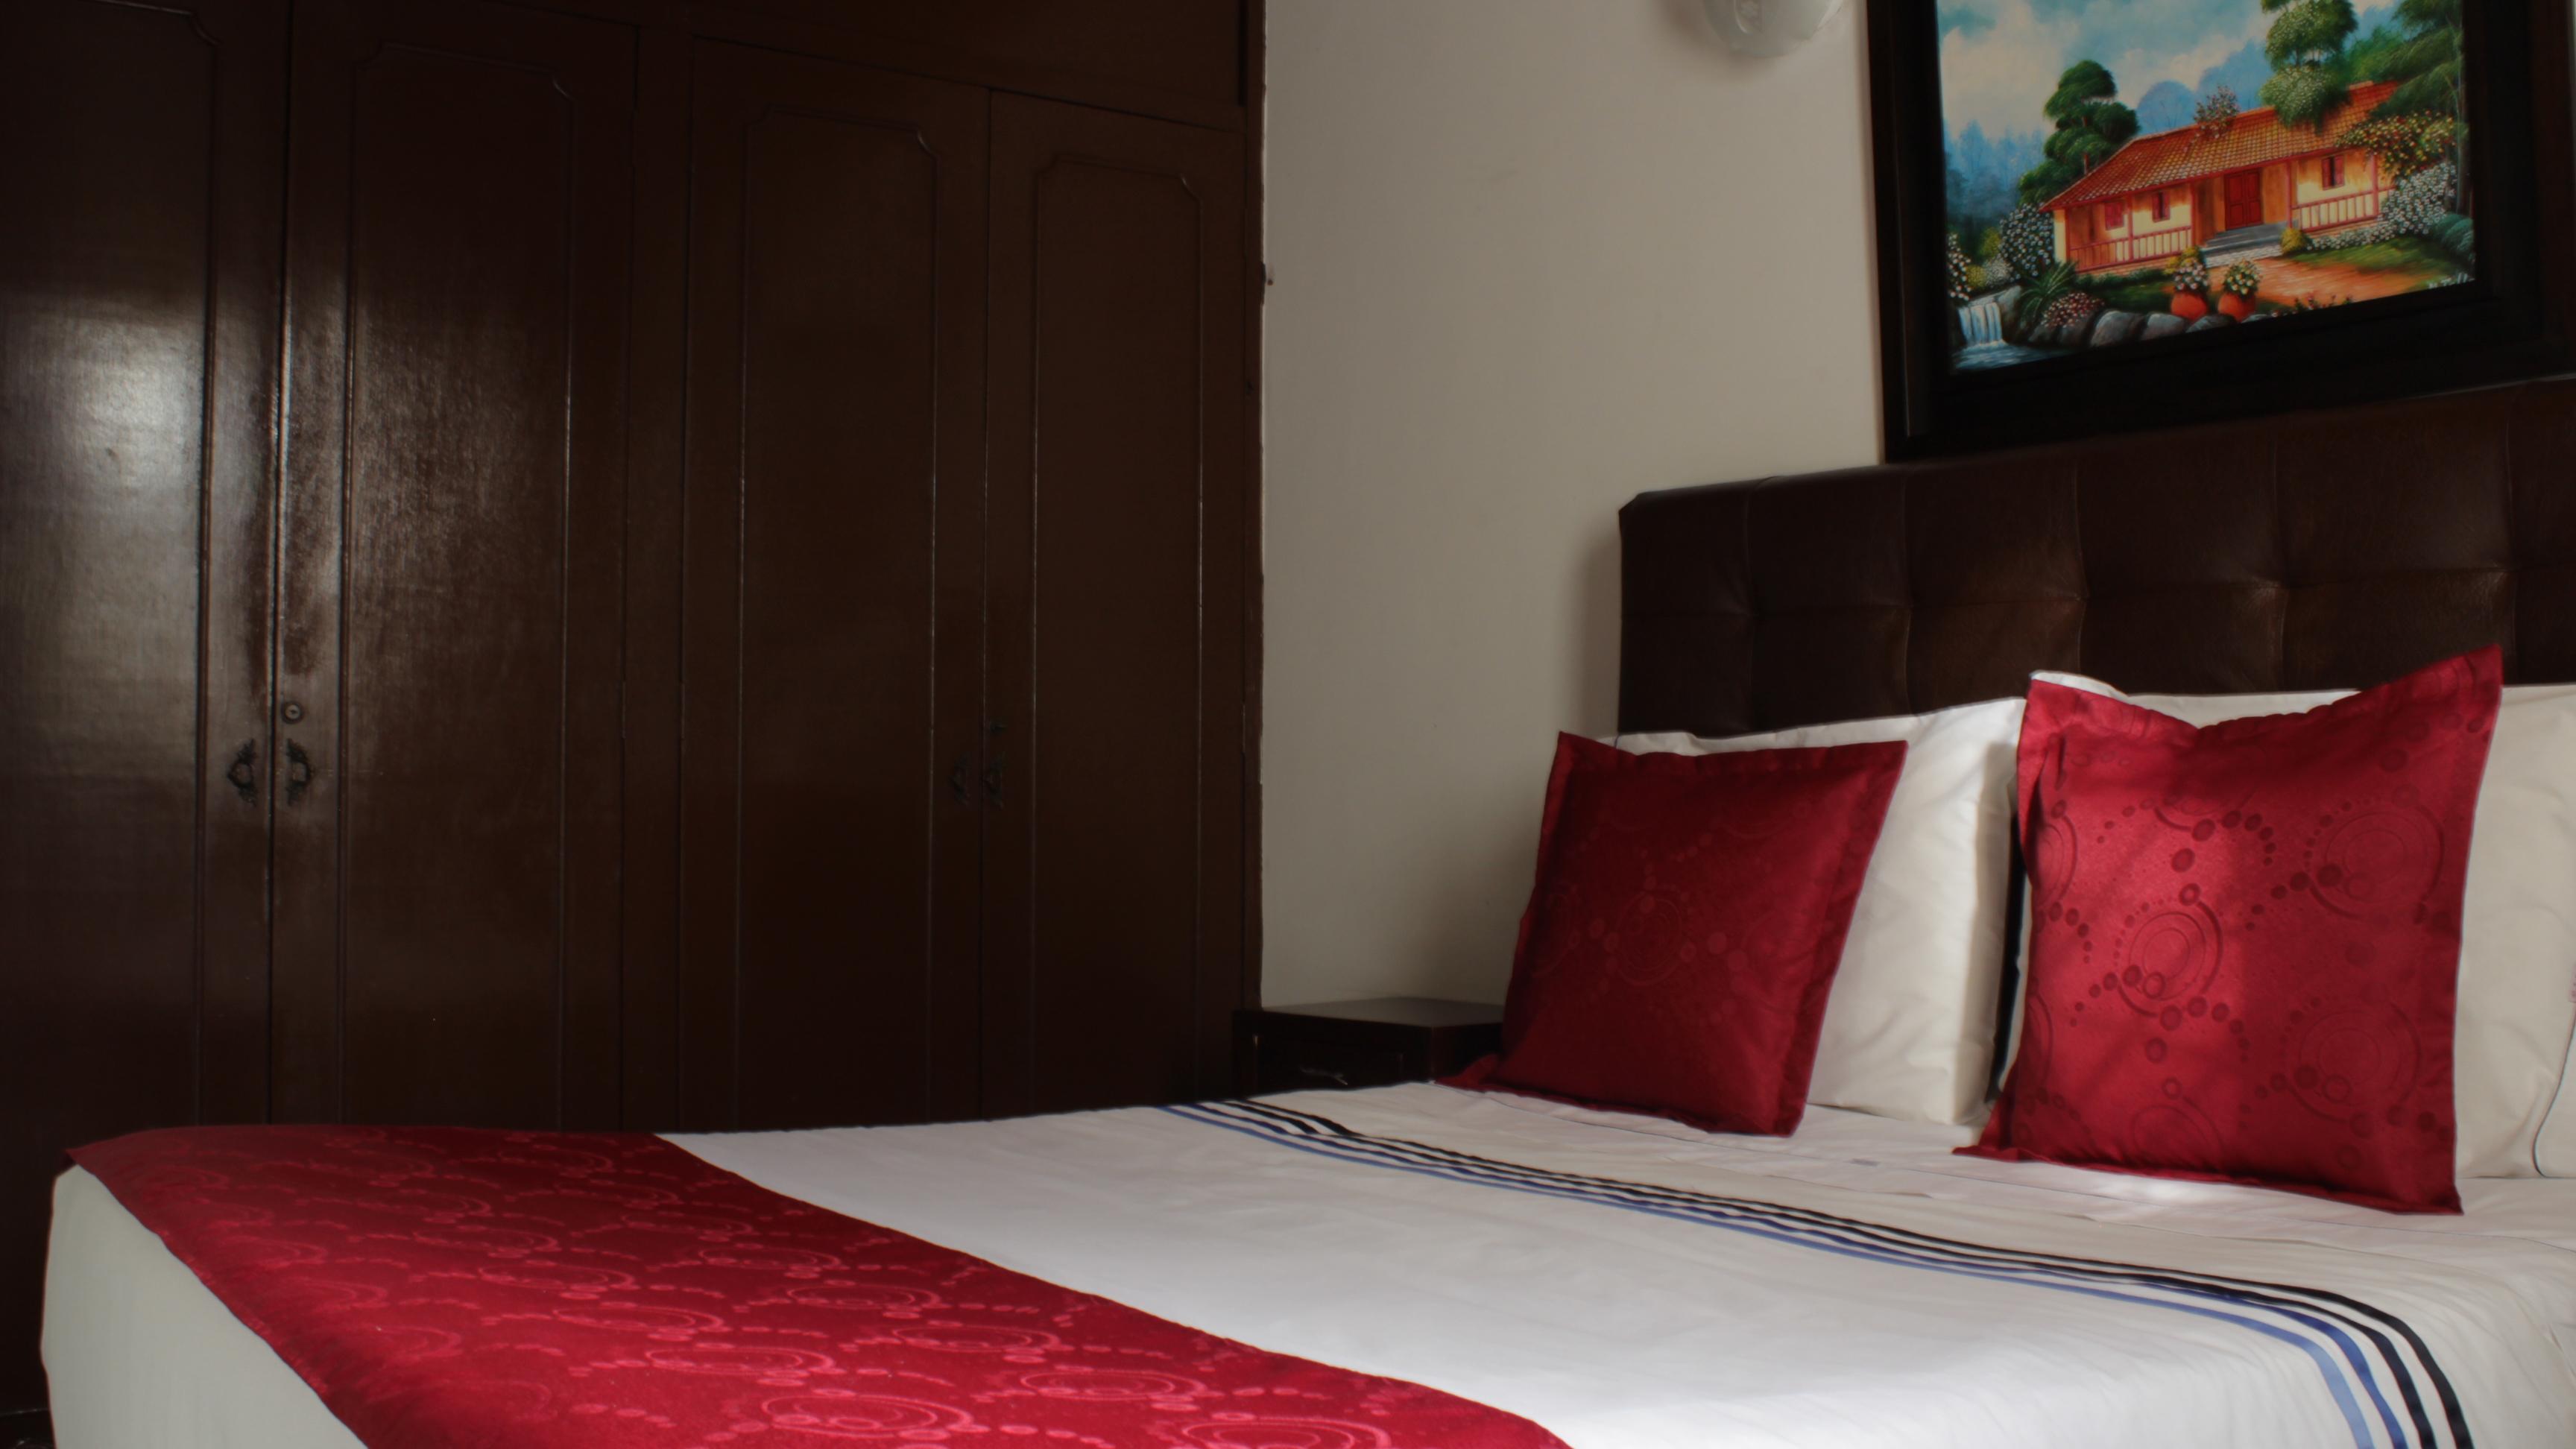 House hotel victoria near clinica corpas bogot colombia casa hotel victoria bogota - Hotel casa victoria suites ...